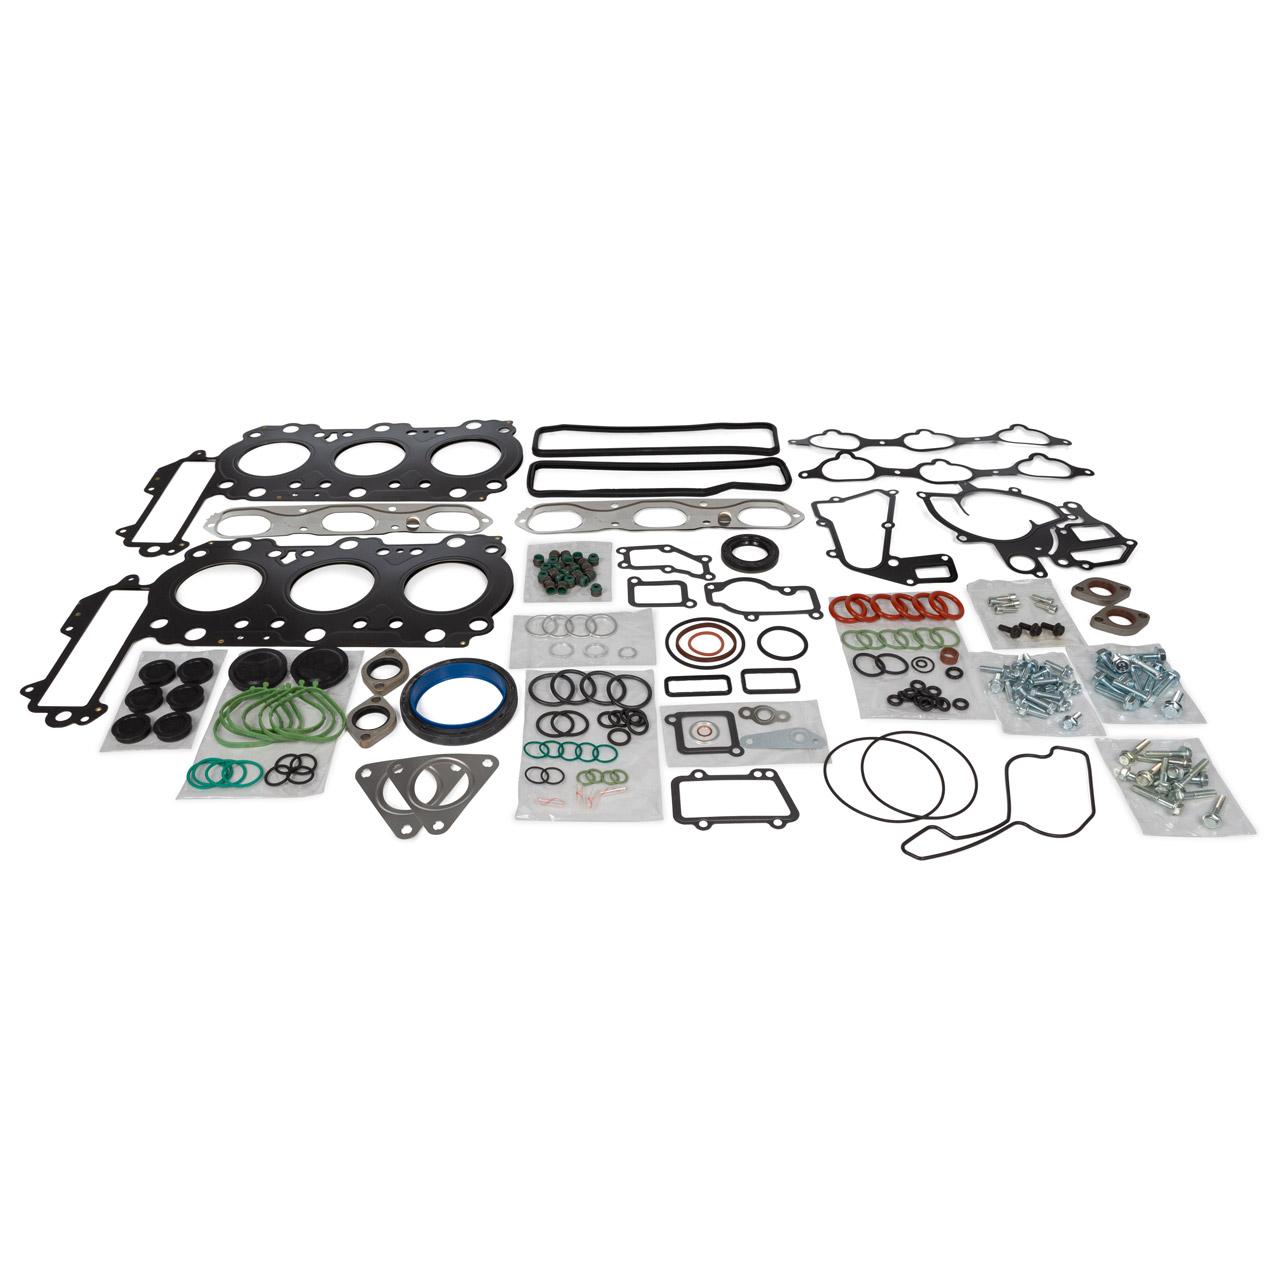 Motordichtungssatz PORSCHE Boxster 986 2.7 228 PS M96.23 2002-2004